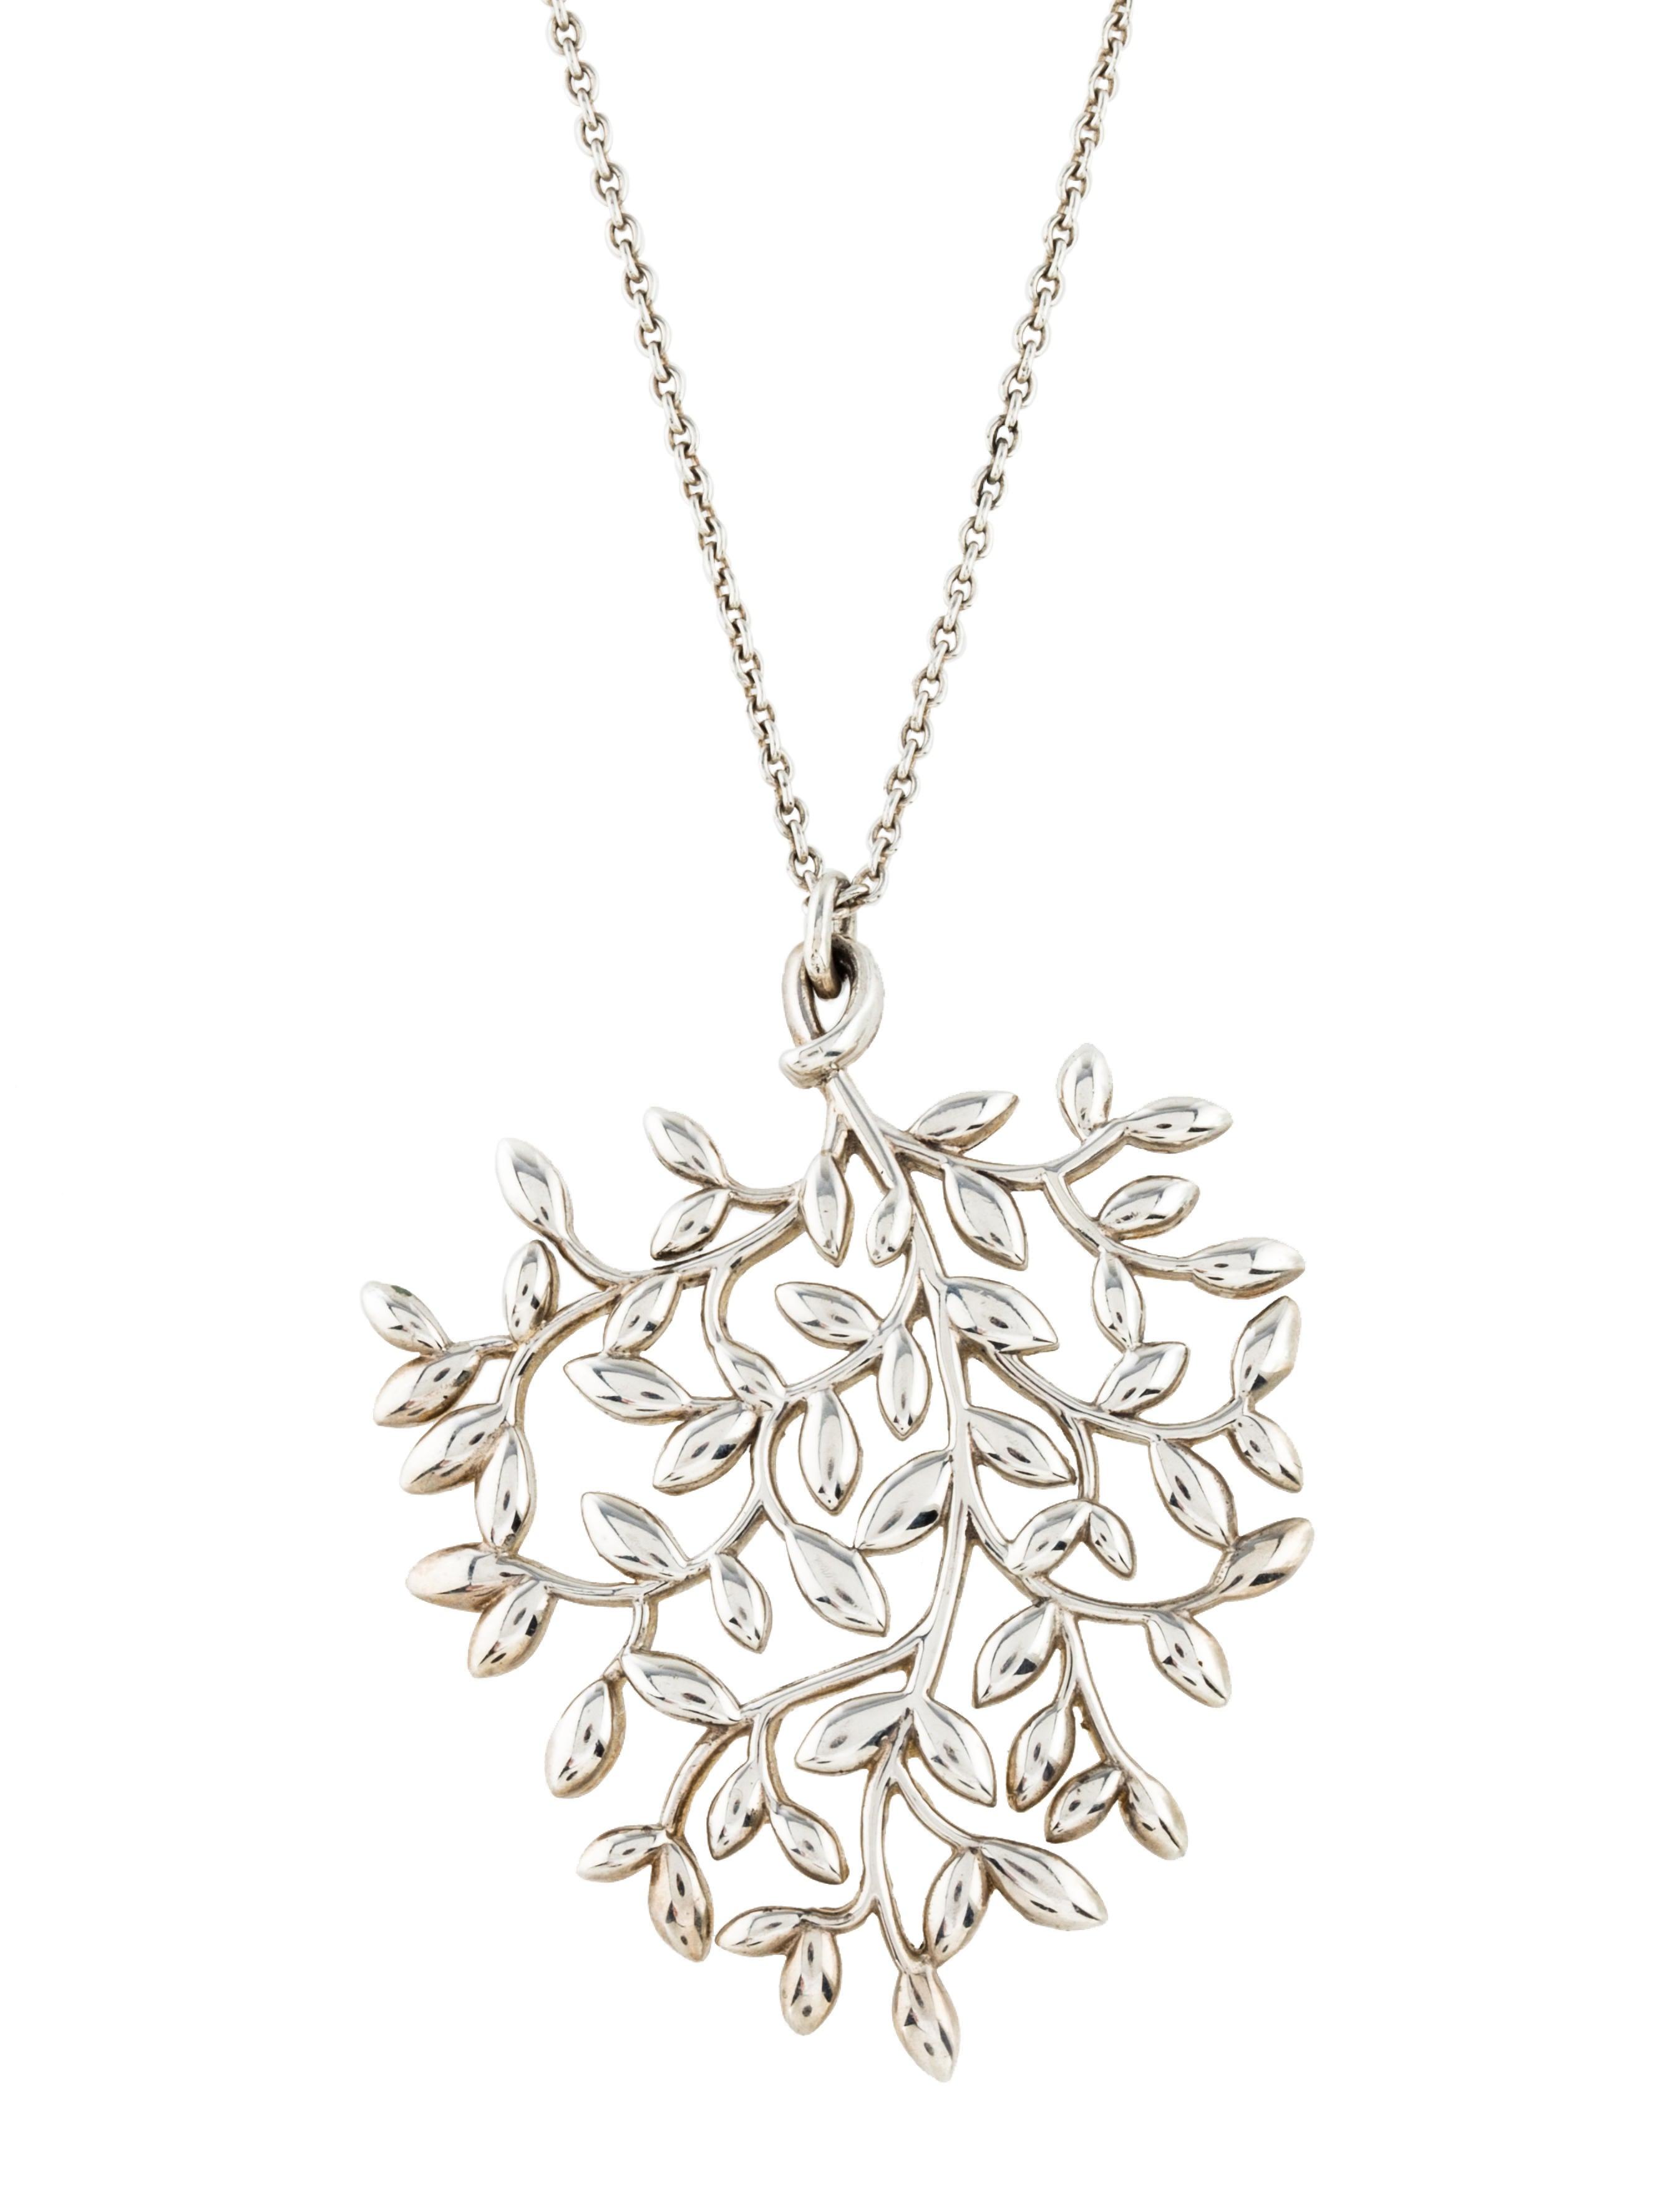 59a35a102 Tiffany & Co. Olive Leaf Pendant Necklace - Necklaces - TIF62223 ...